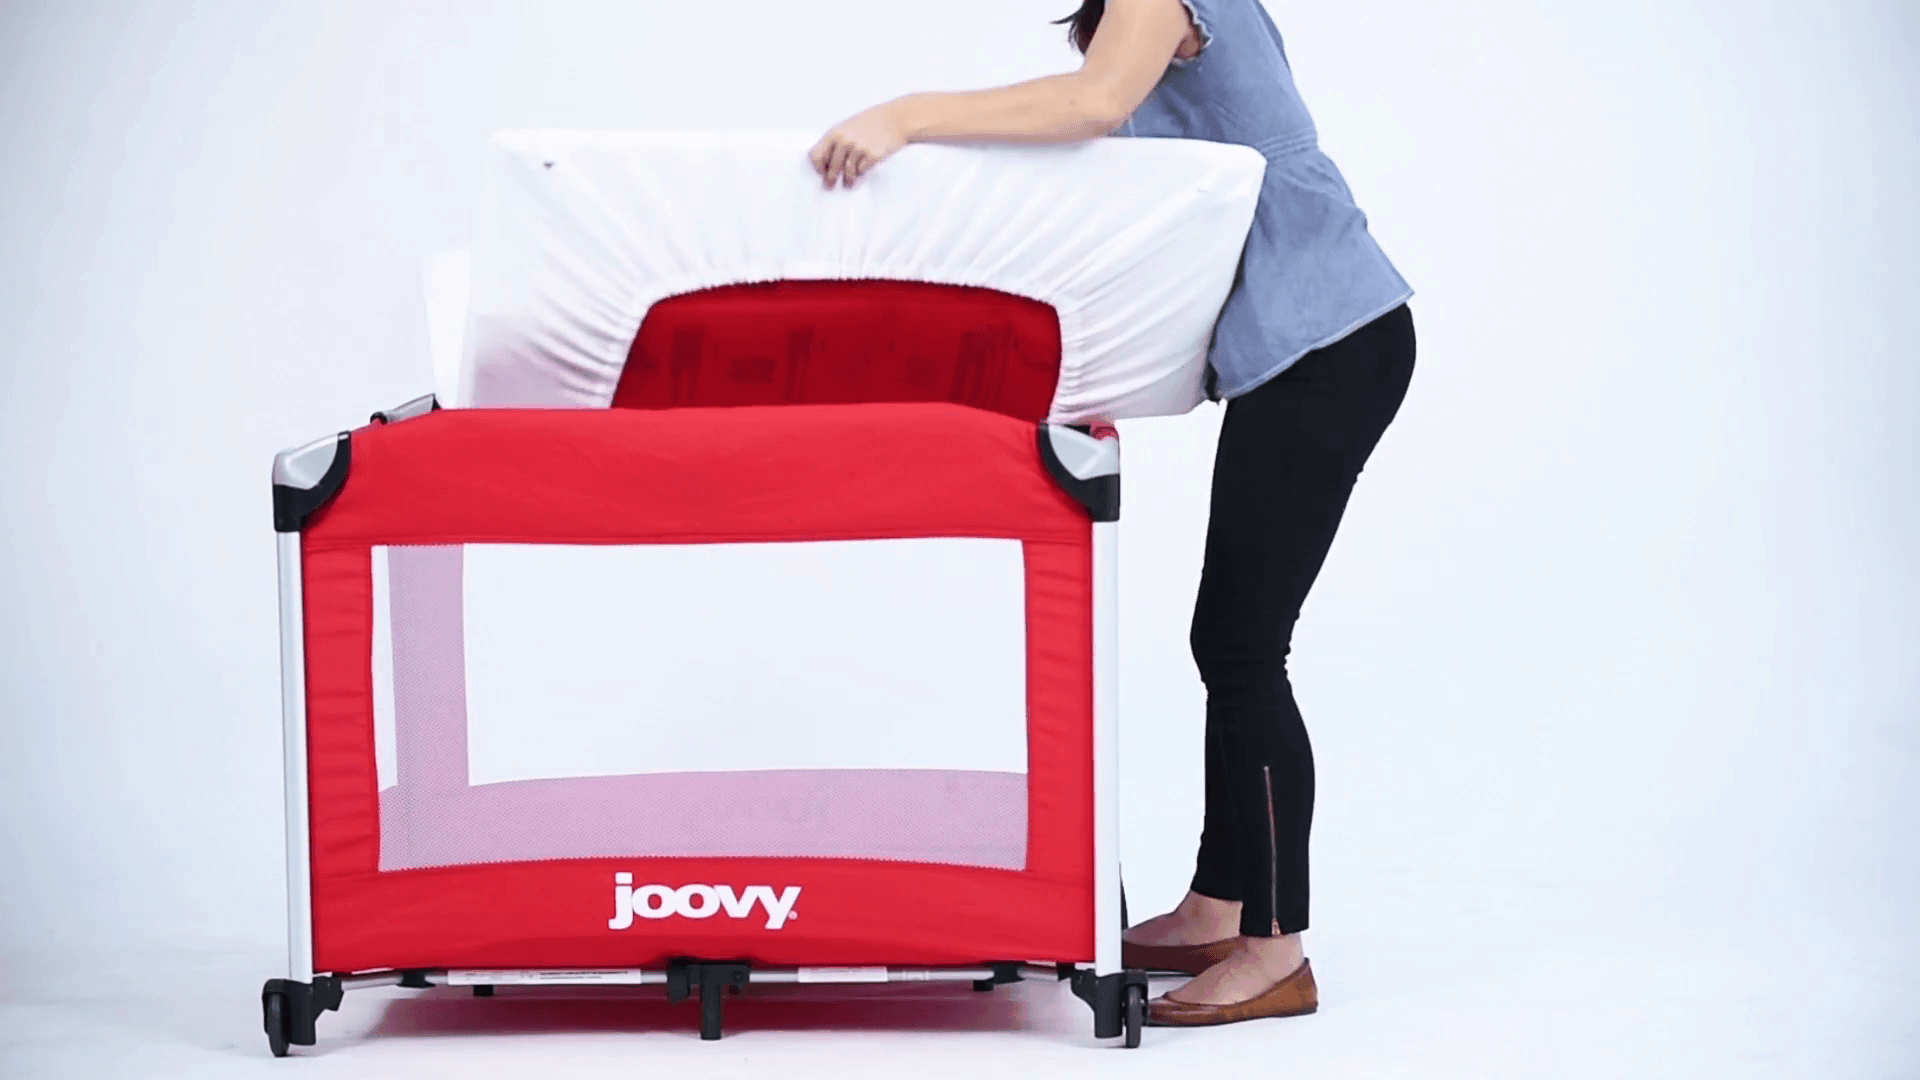 Joovy new room2